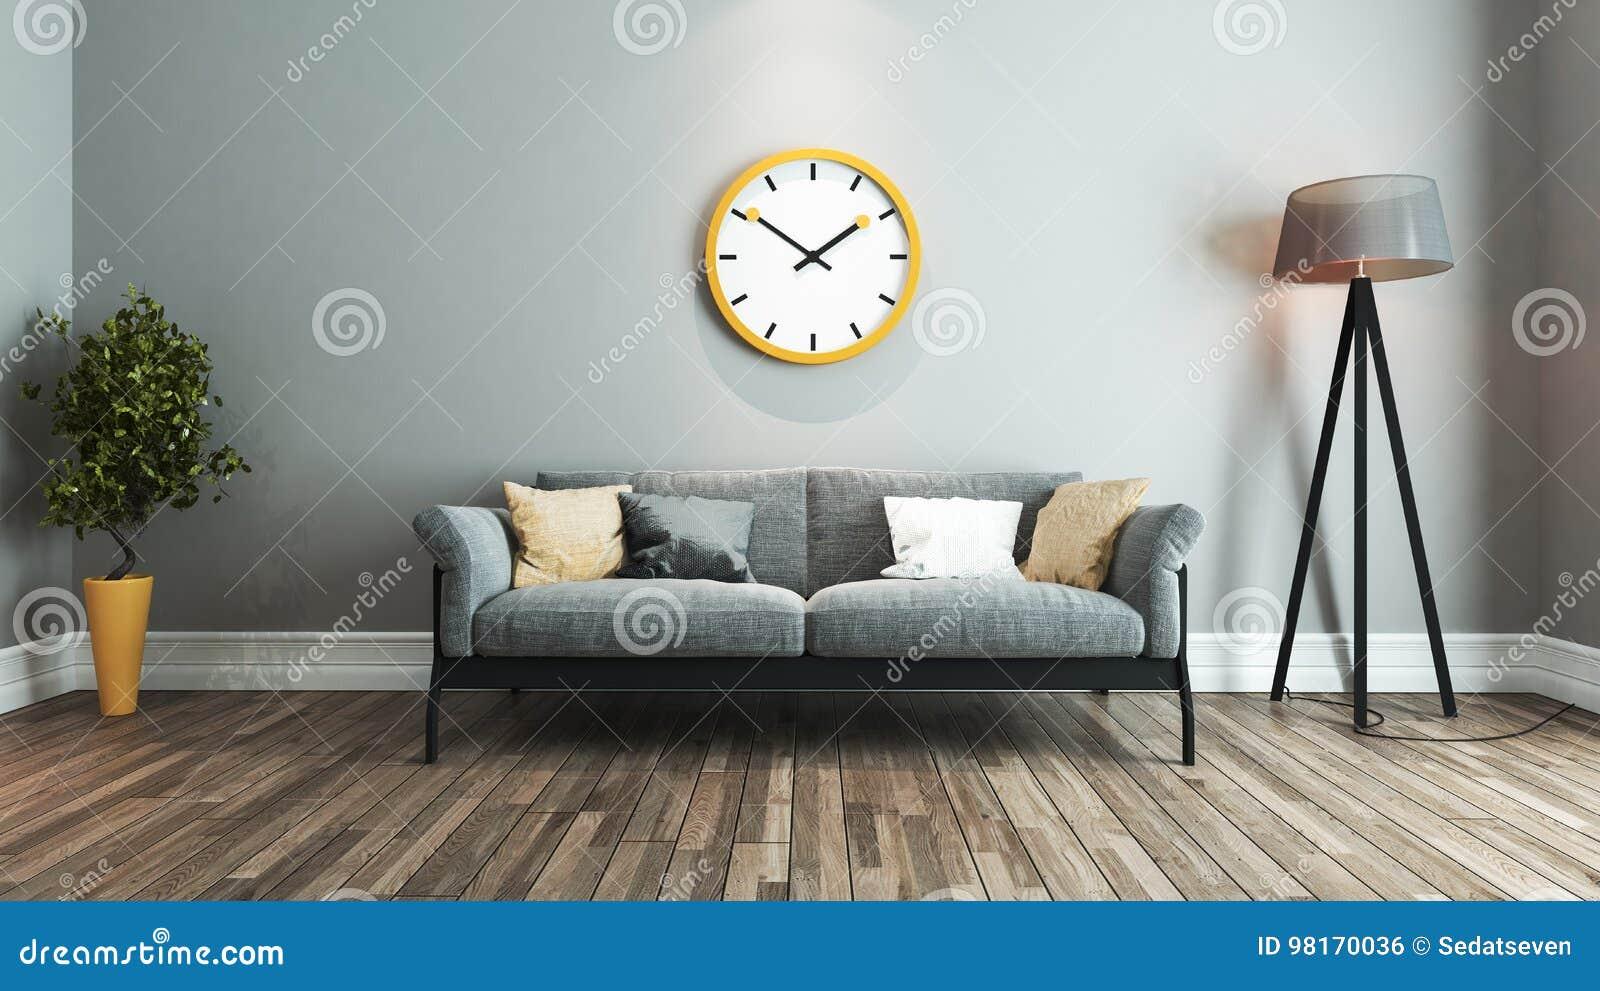 . Living Room Interior Design Idea With Big Yellow Watch Stock